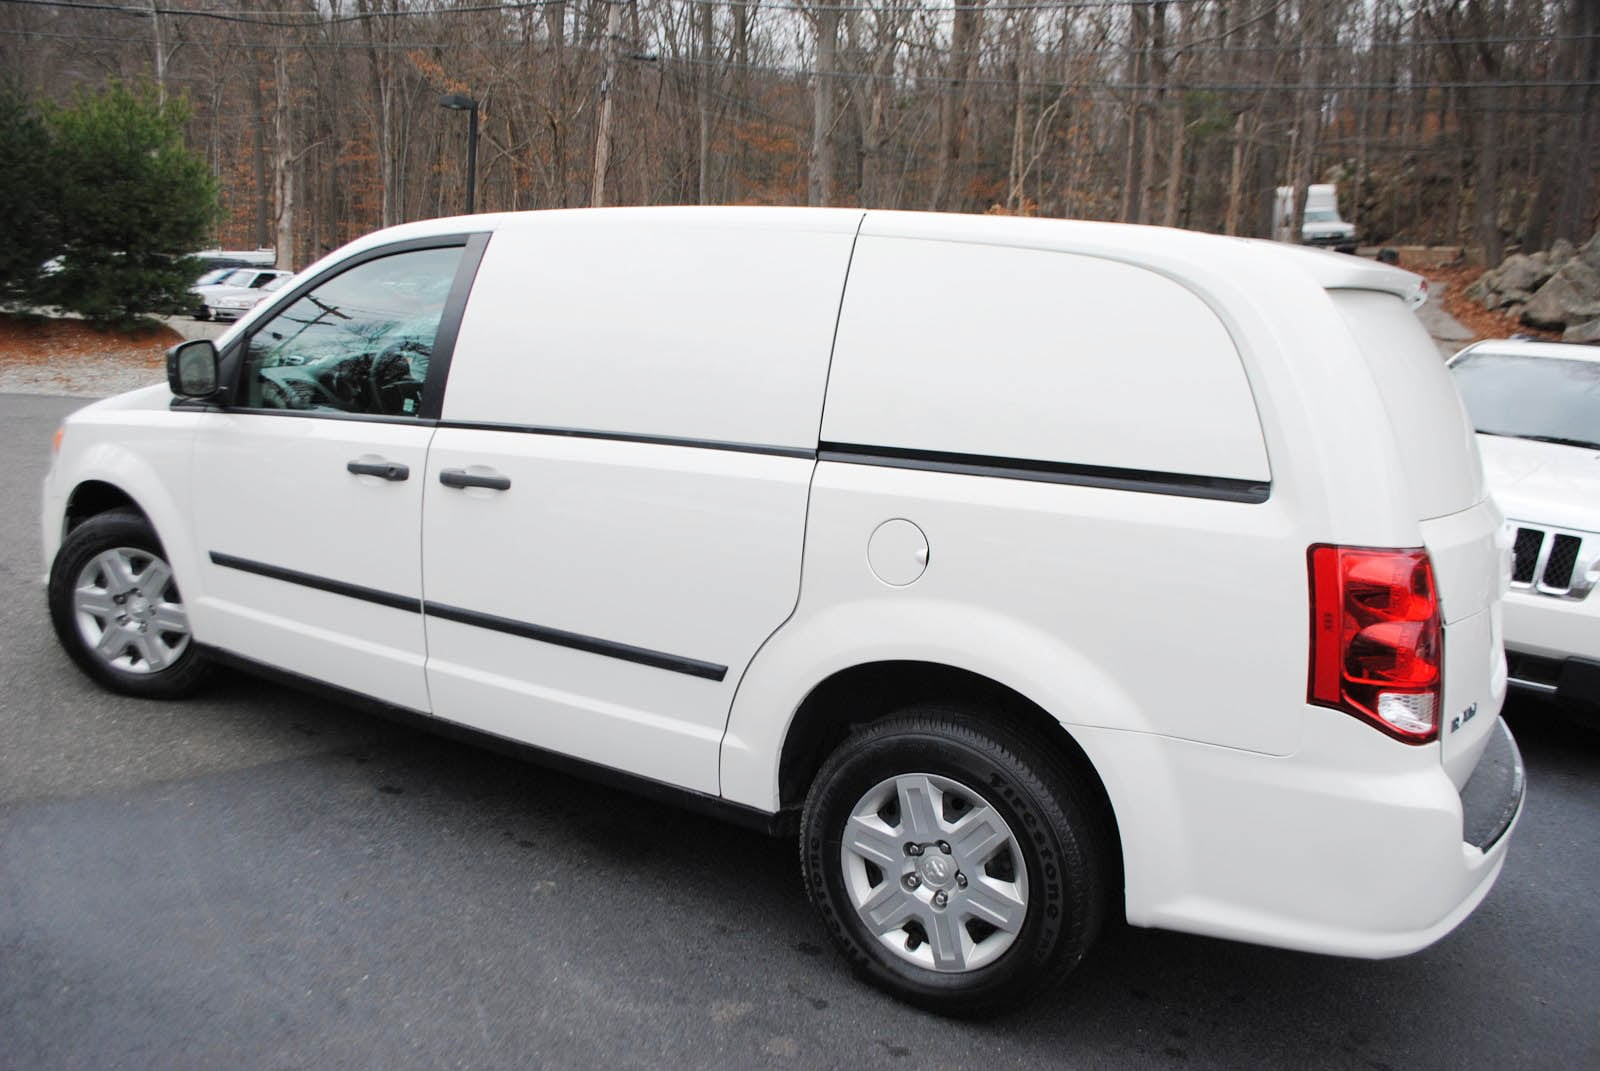 Vehicles Classifieds Search Engine. | Search-Vehicles.com |2013 Ram Cargo Tradesman Van